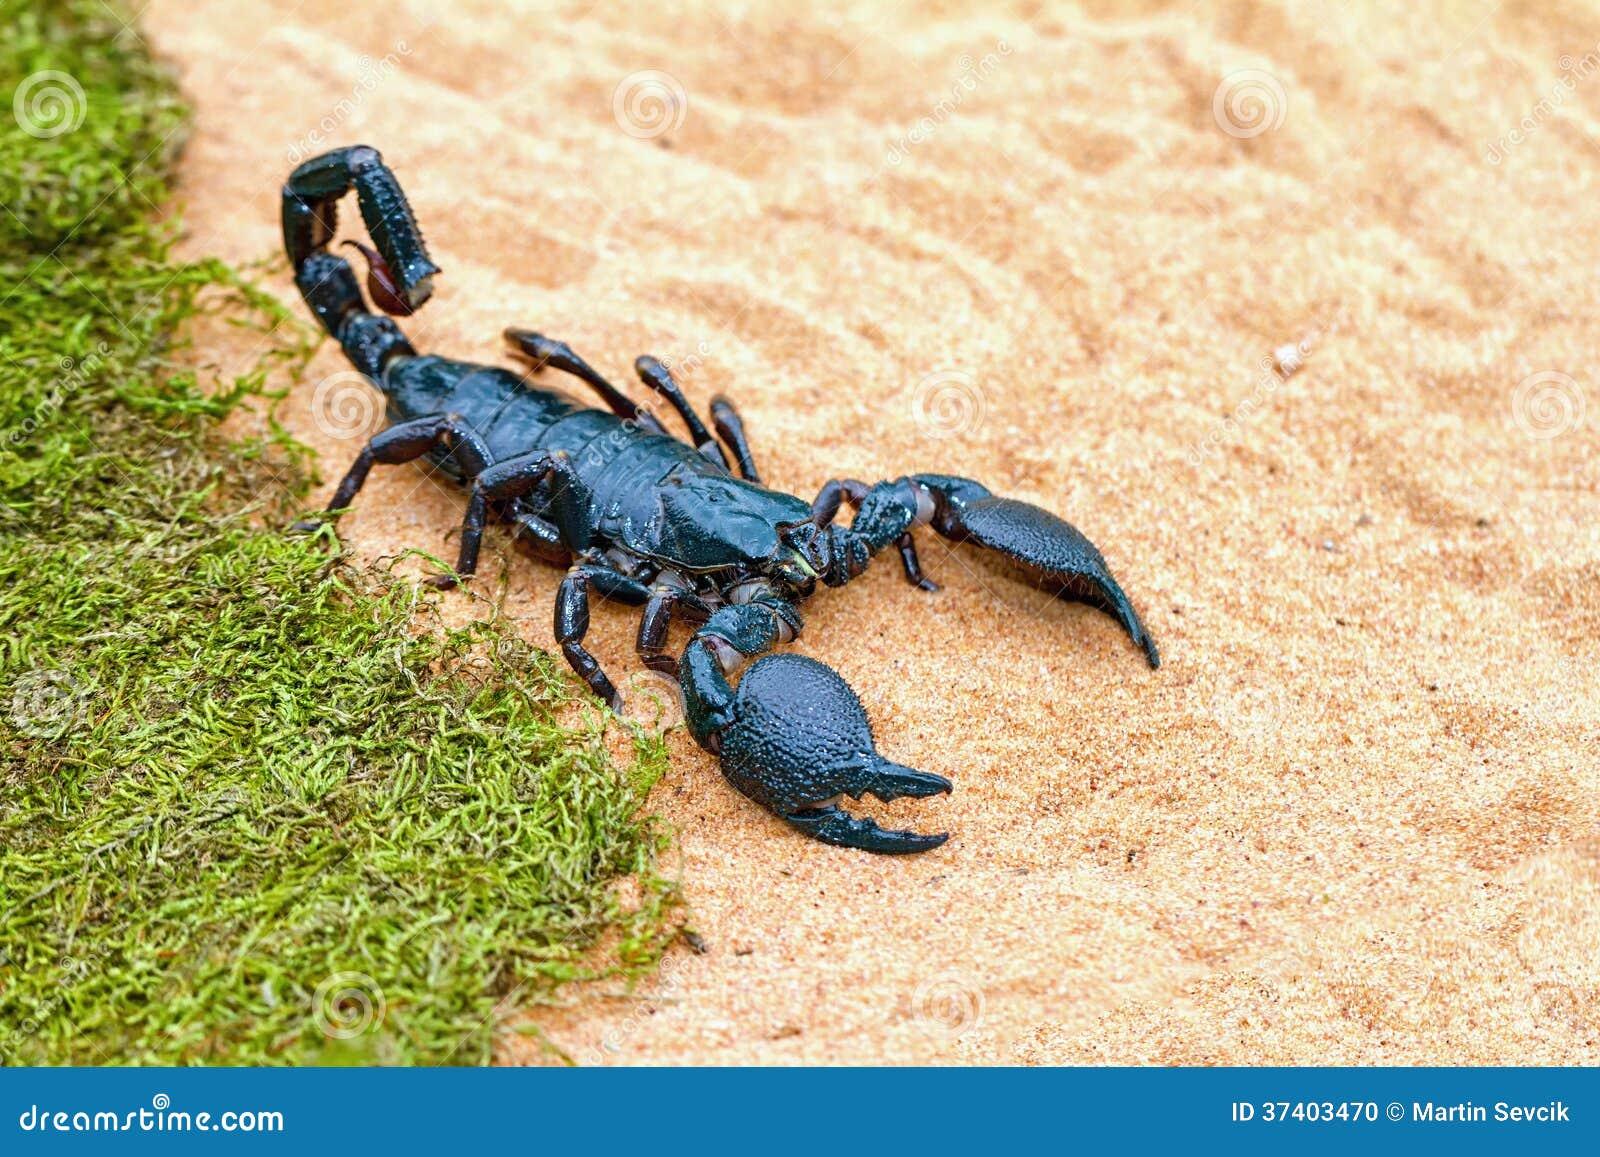 Biggest scorpion in the world - photo#6